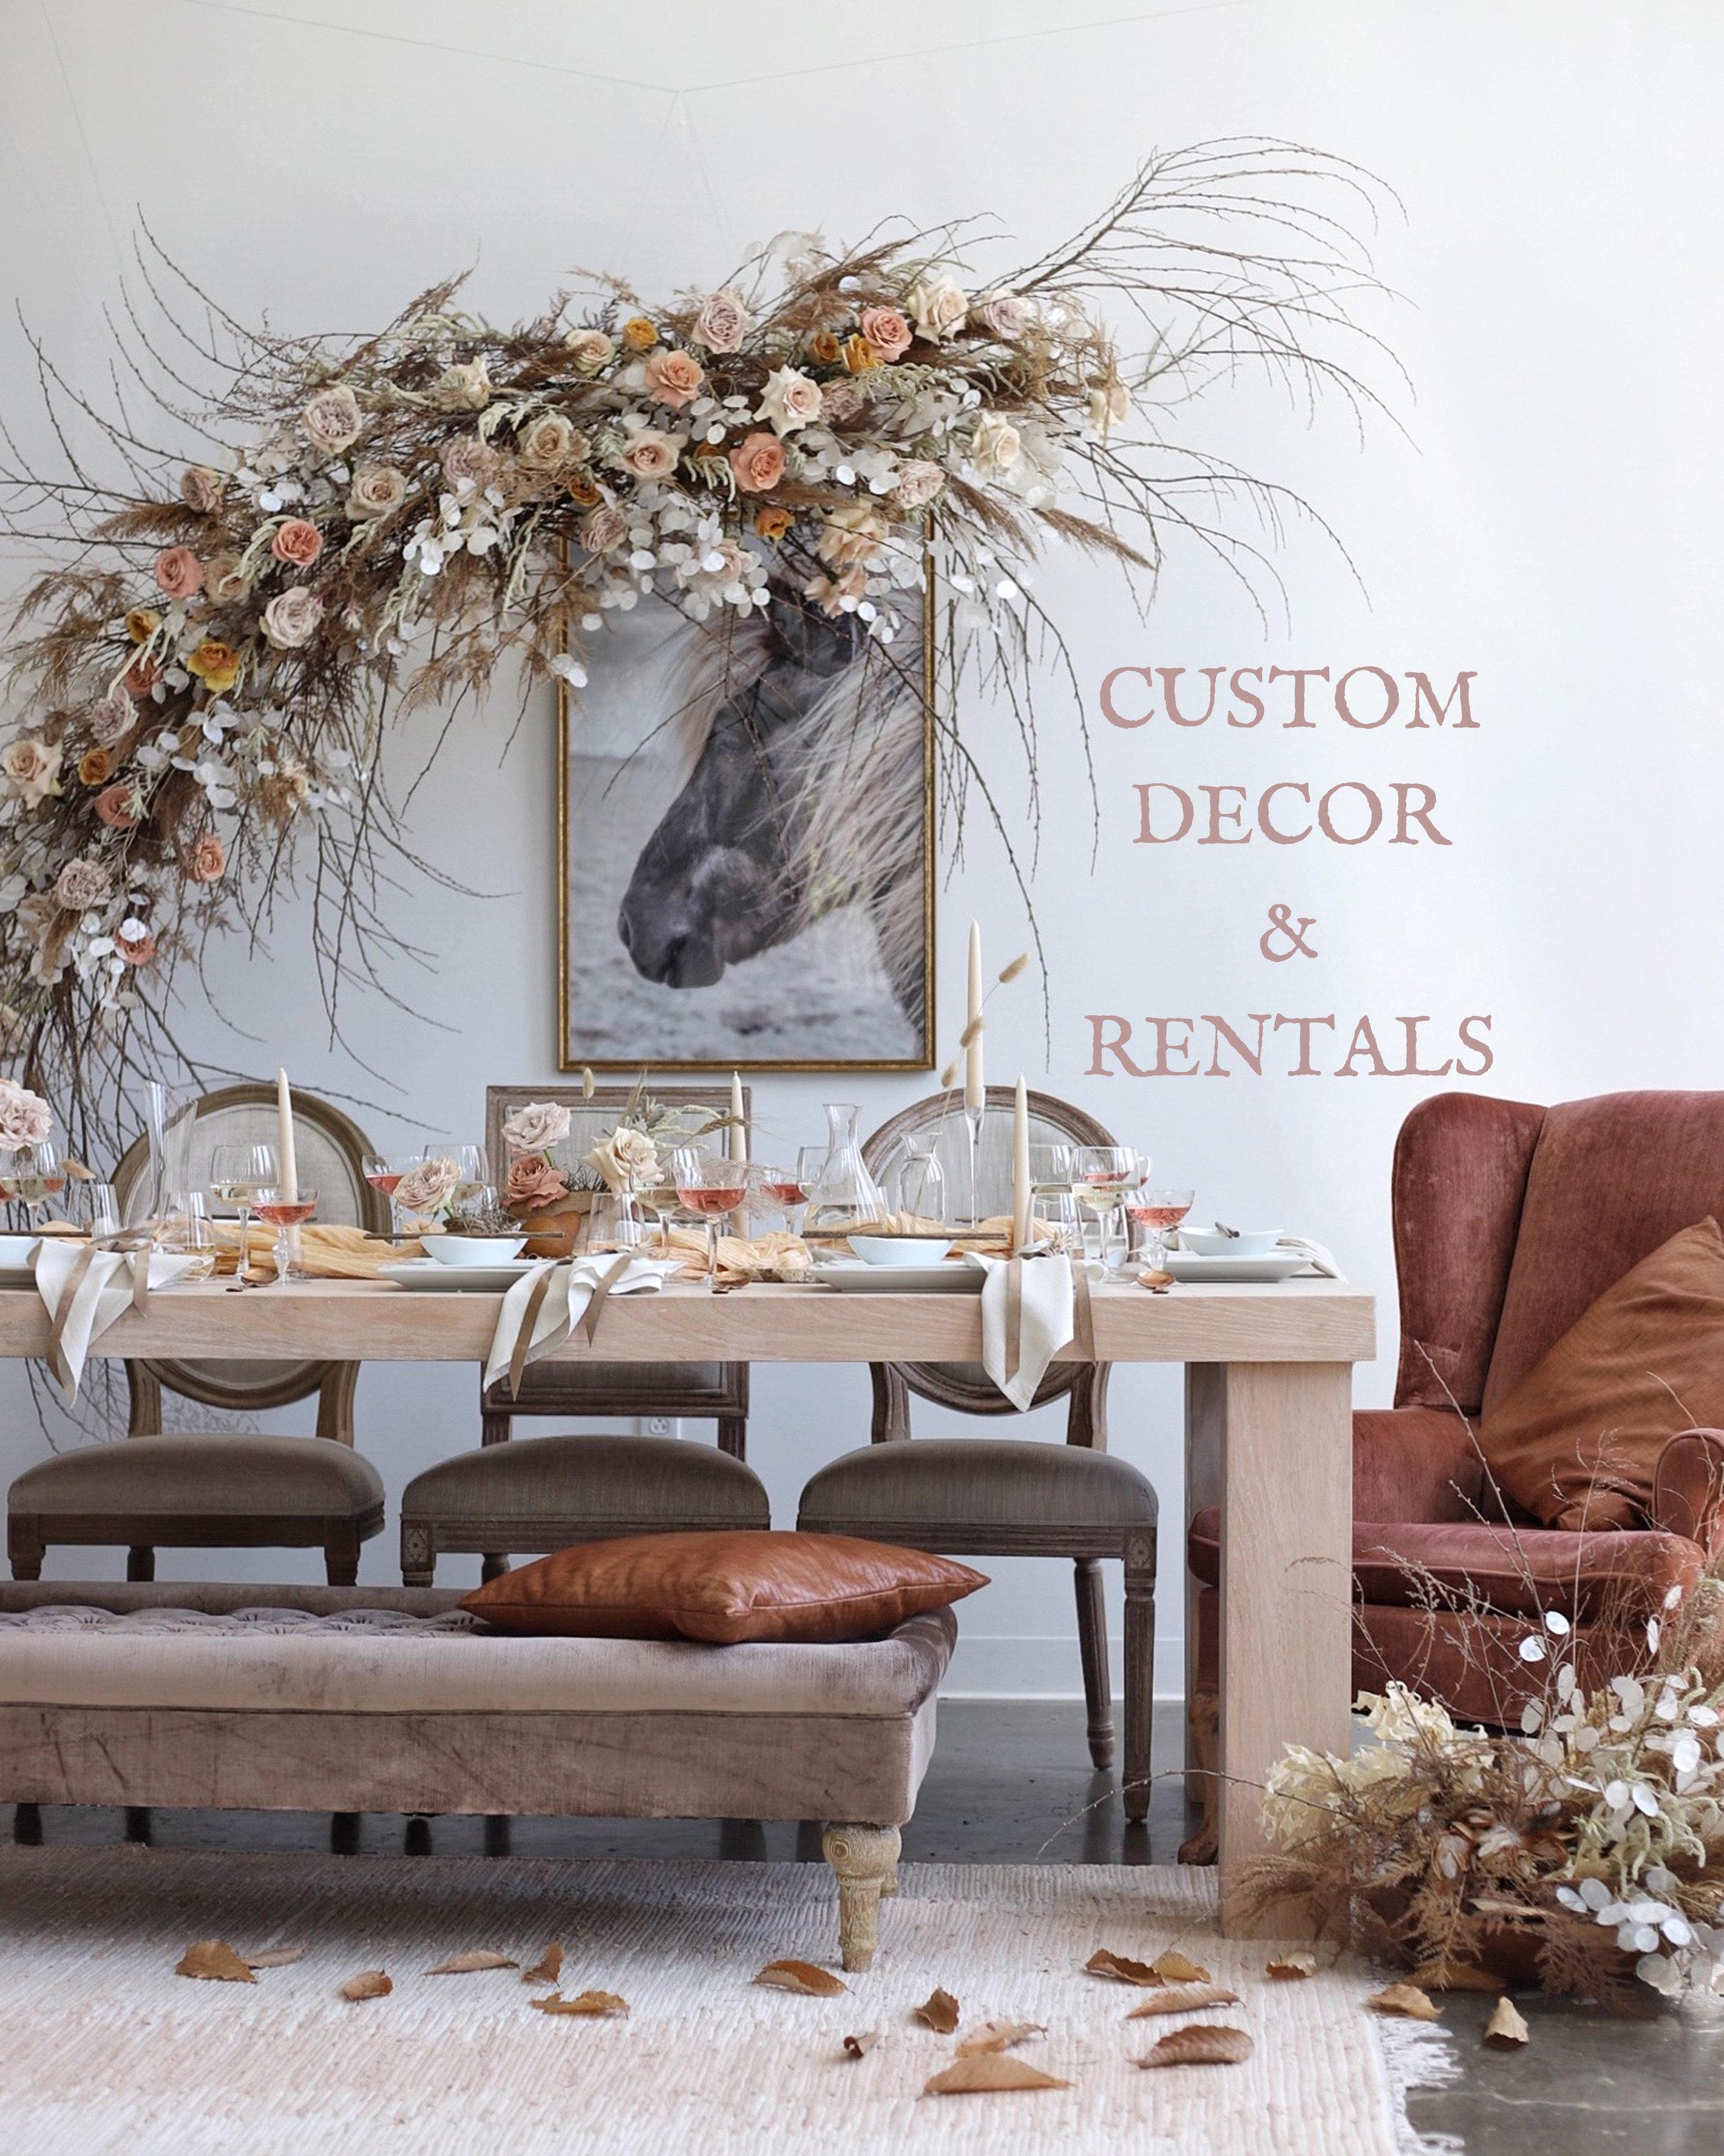 Our Custom Decor & Rentals Vertical.jpg